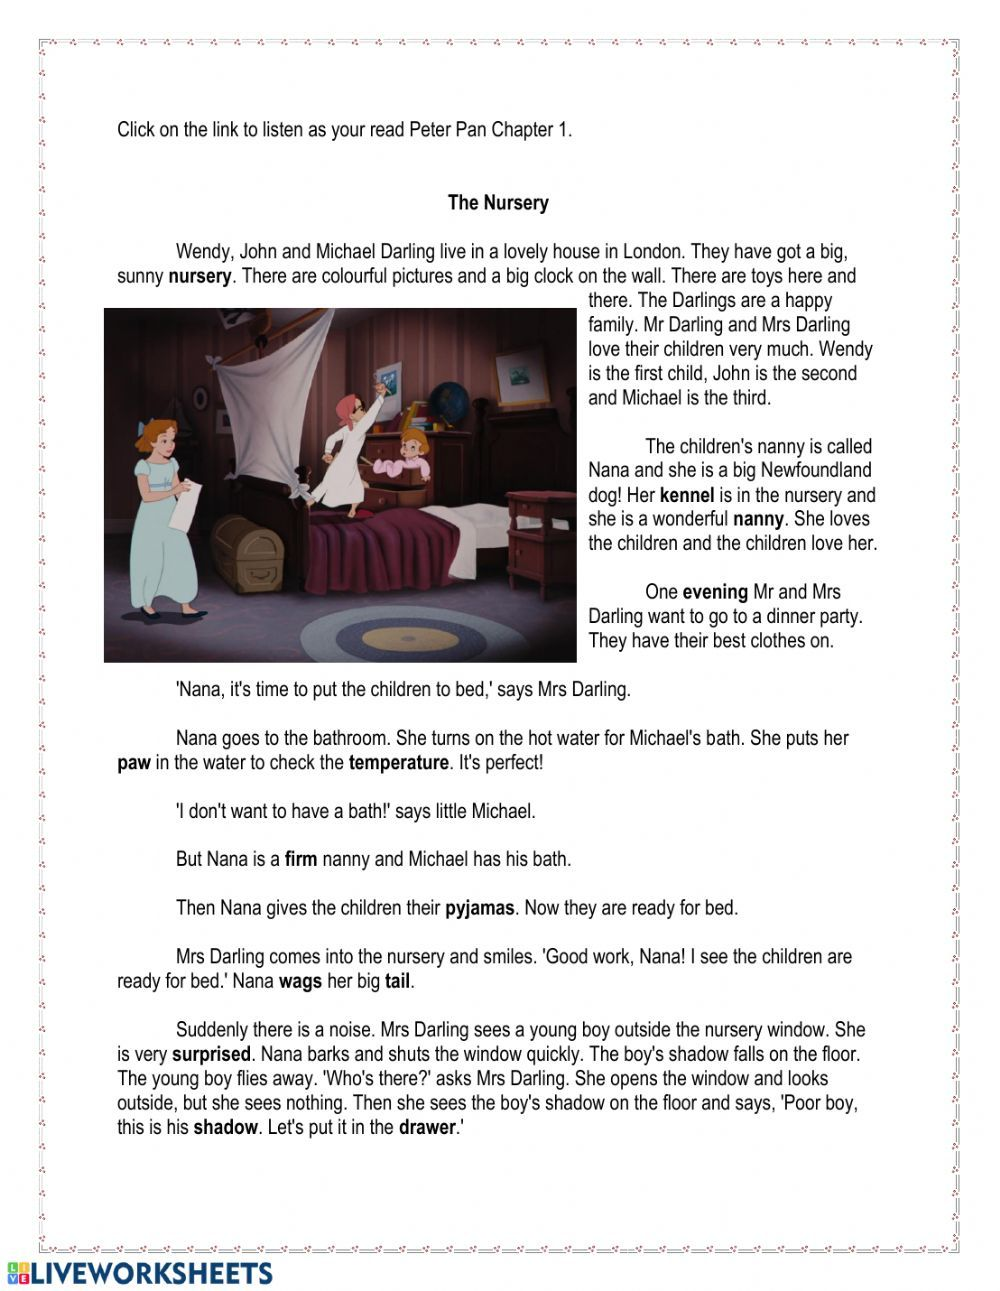 medium resolution of Peter Pan Chapter 1 - Interactive worksheet   Peter pan